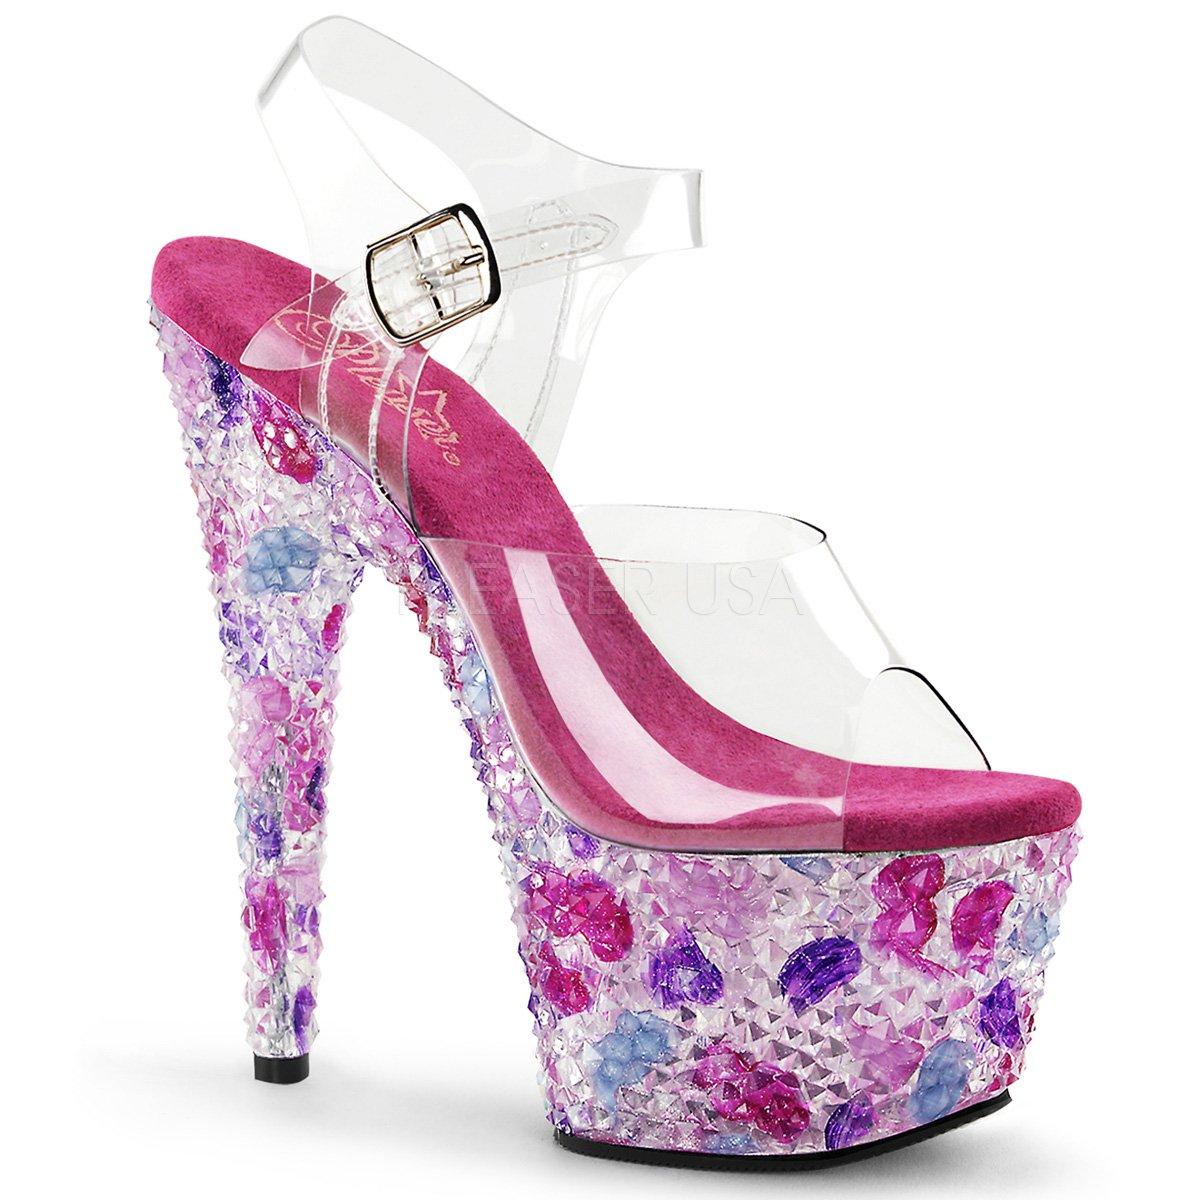 Pleaser Crystalize-708 sexy High Heels Poledance Gogo Strass Sandaletten Transparent Hot Pink Fuchsia 35-41 Pink